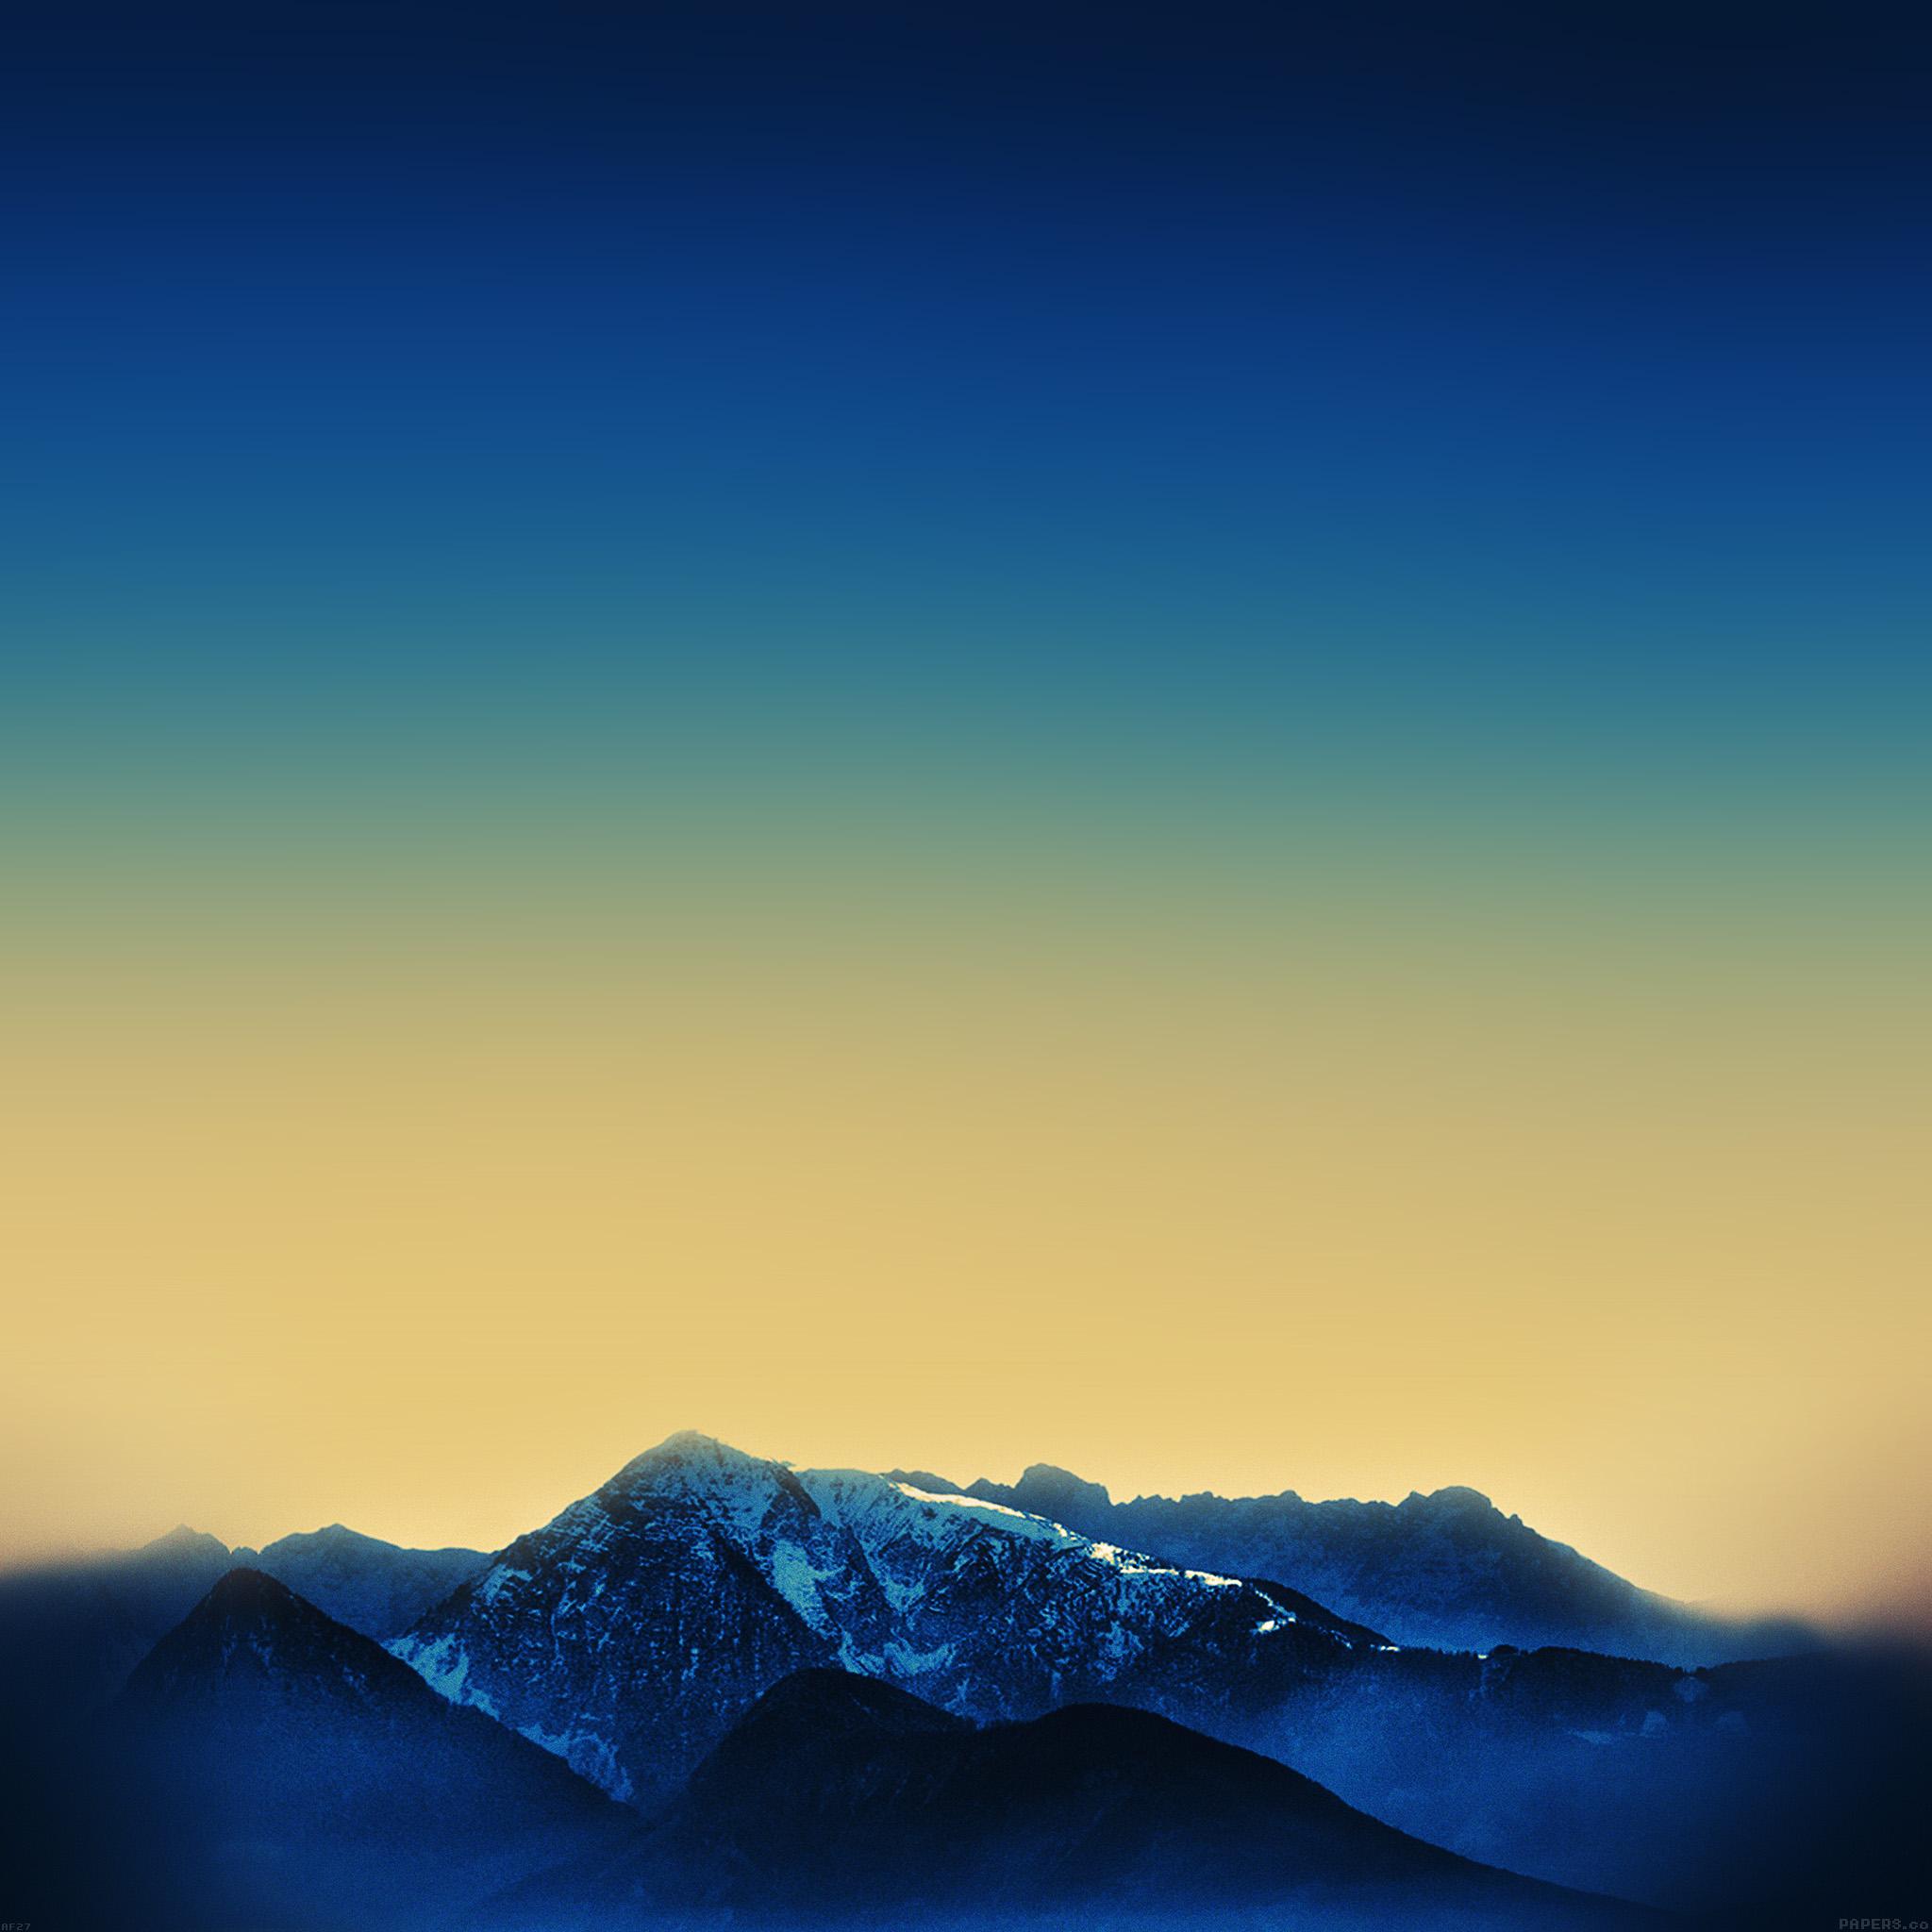 af27-ipad-air-2-dark-blue-wallpaper-official-mountain ...